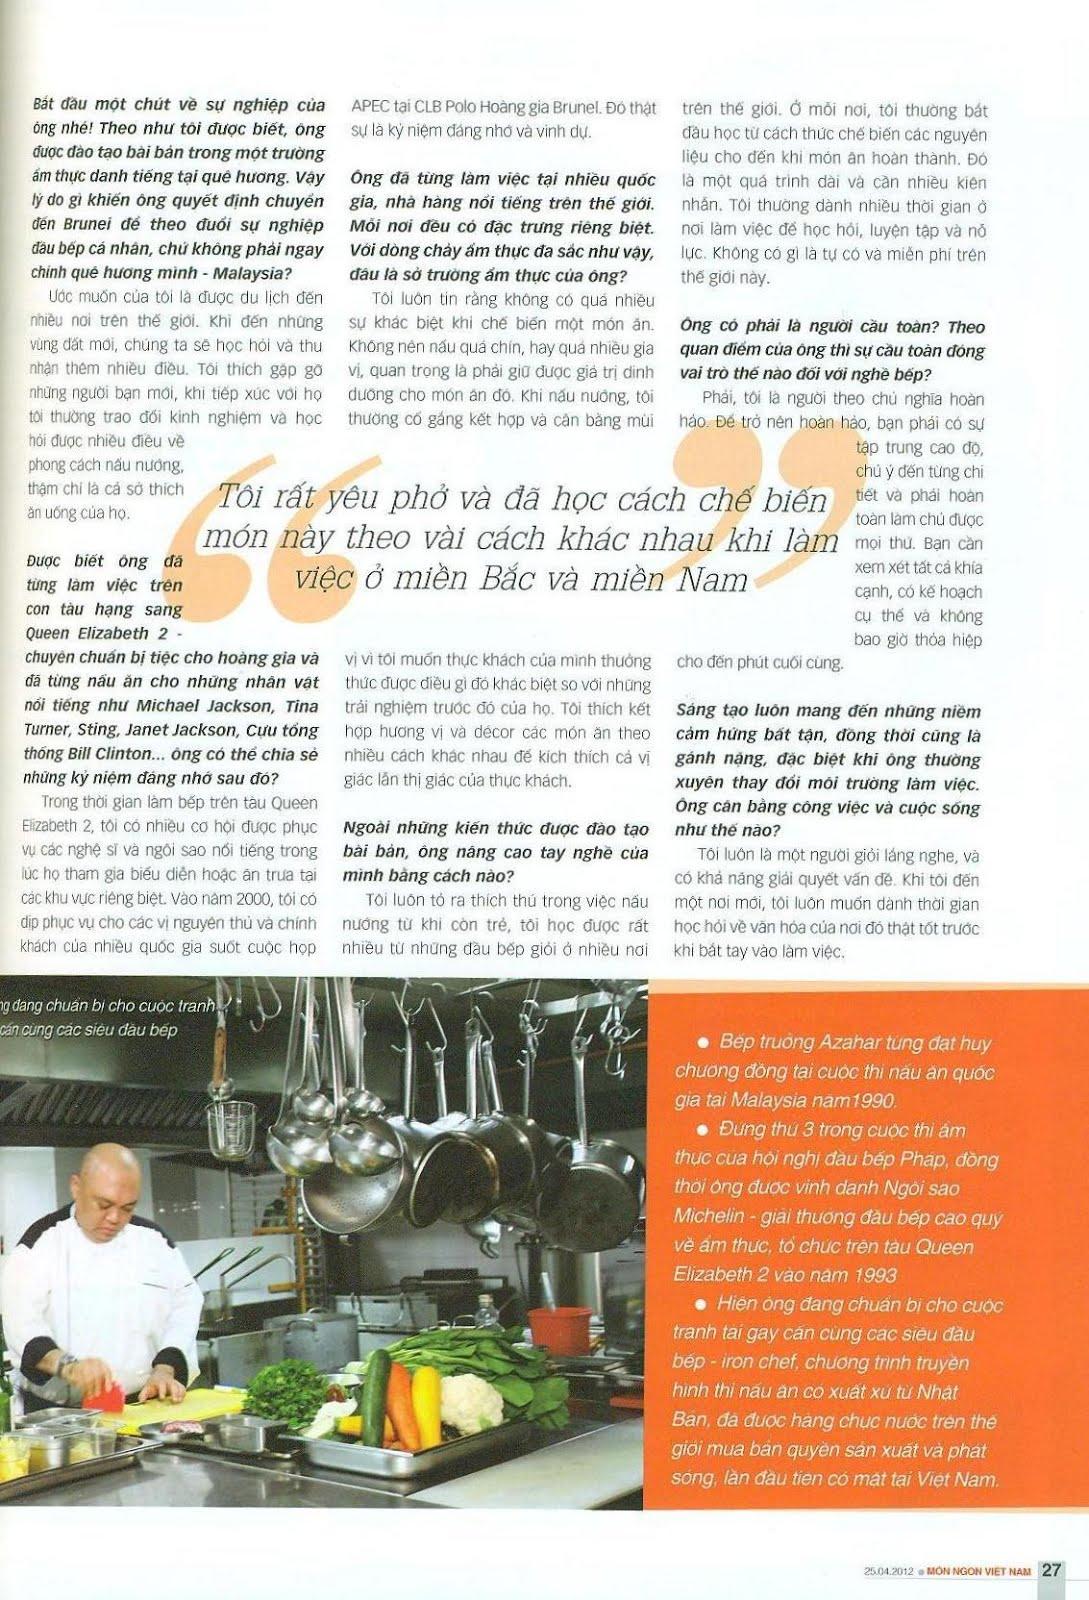 chef azahar curriculum vitae